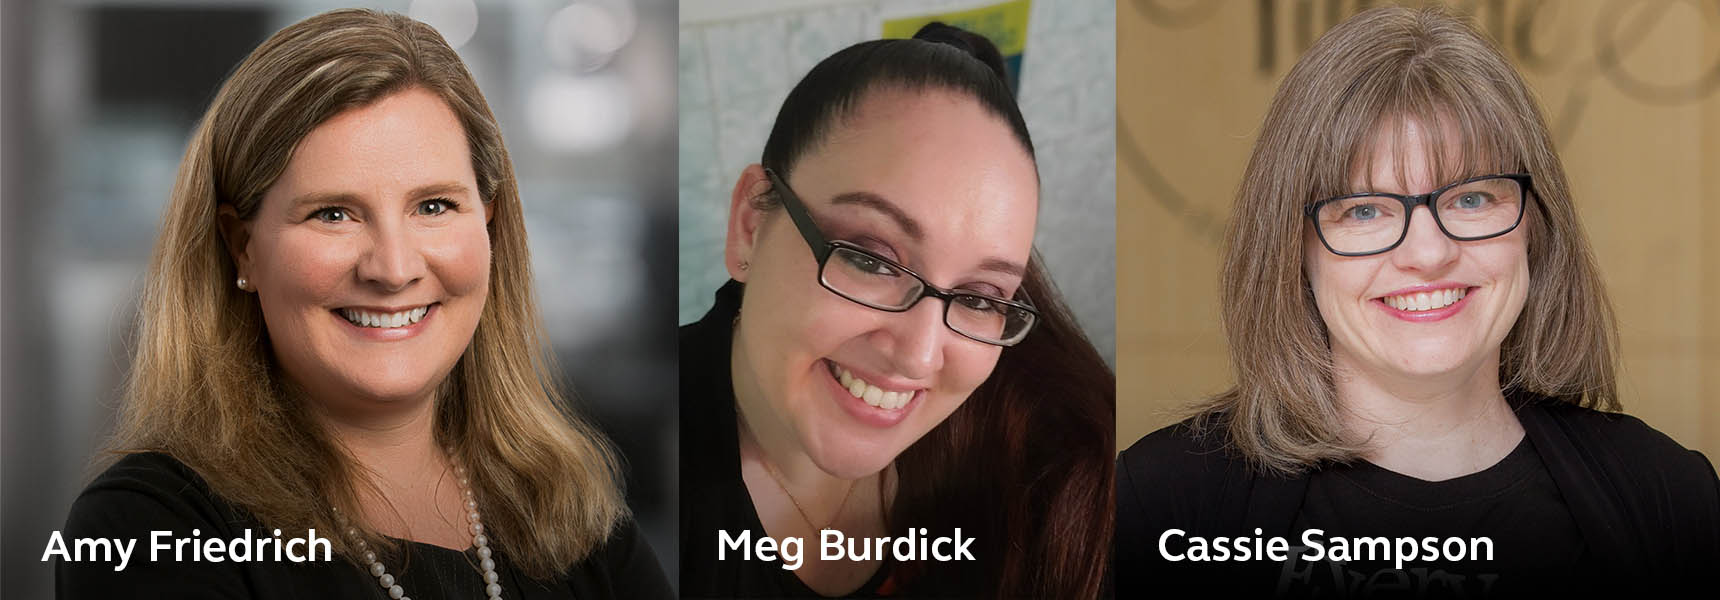 Photo of Cassie Sampson, Meg Burdick, and Amy Friedrich.